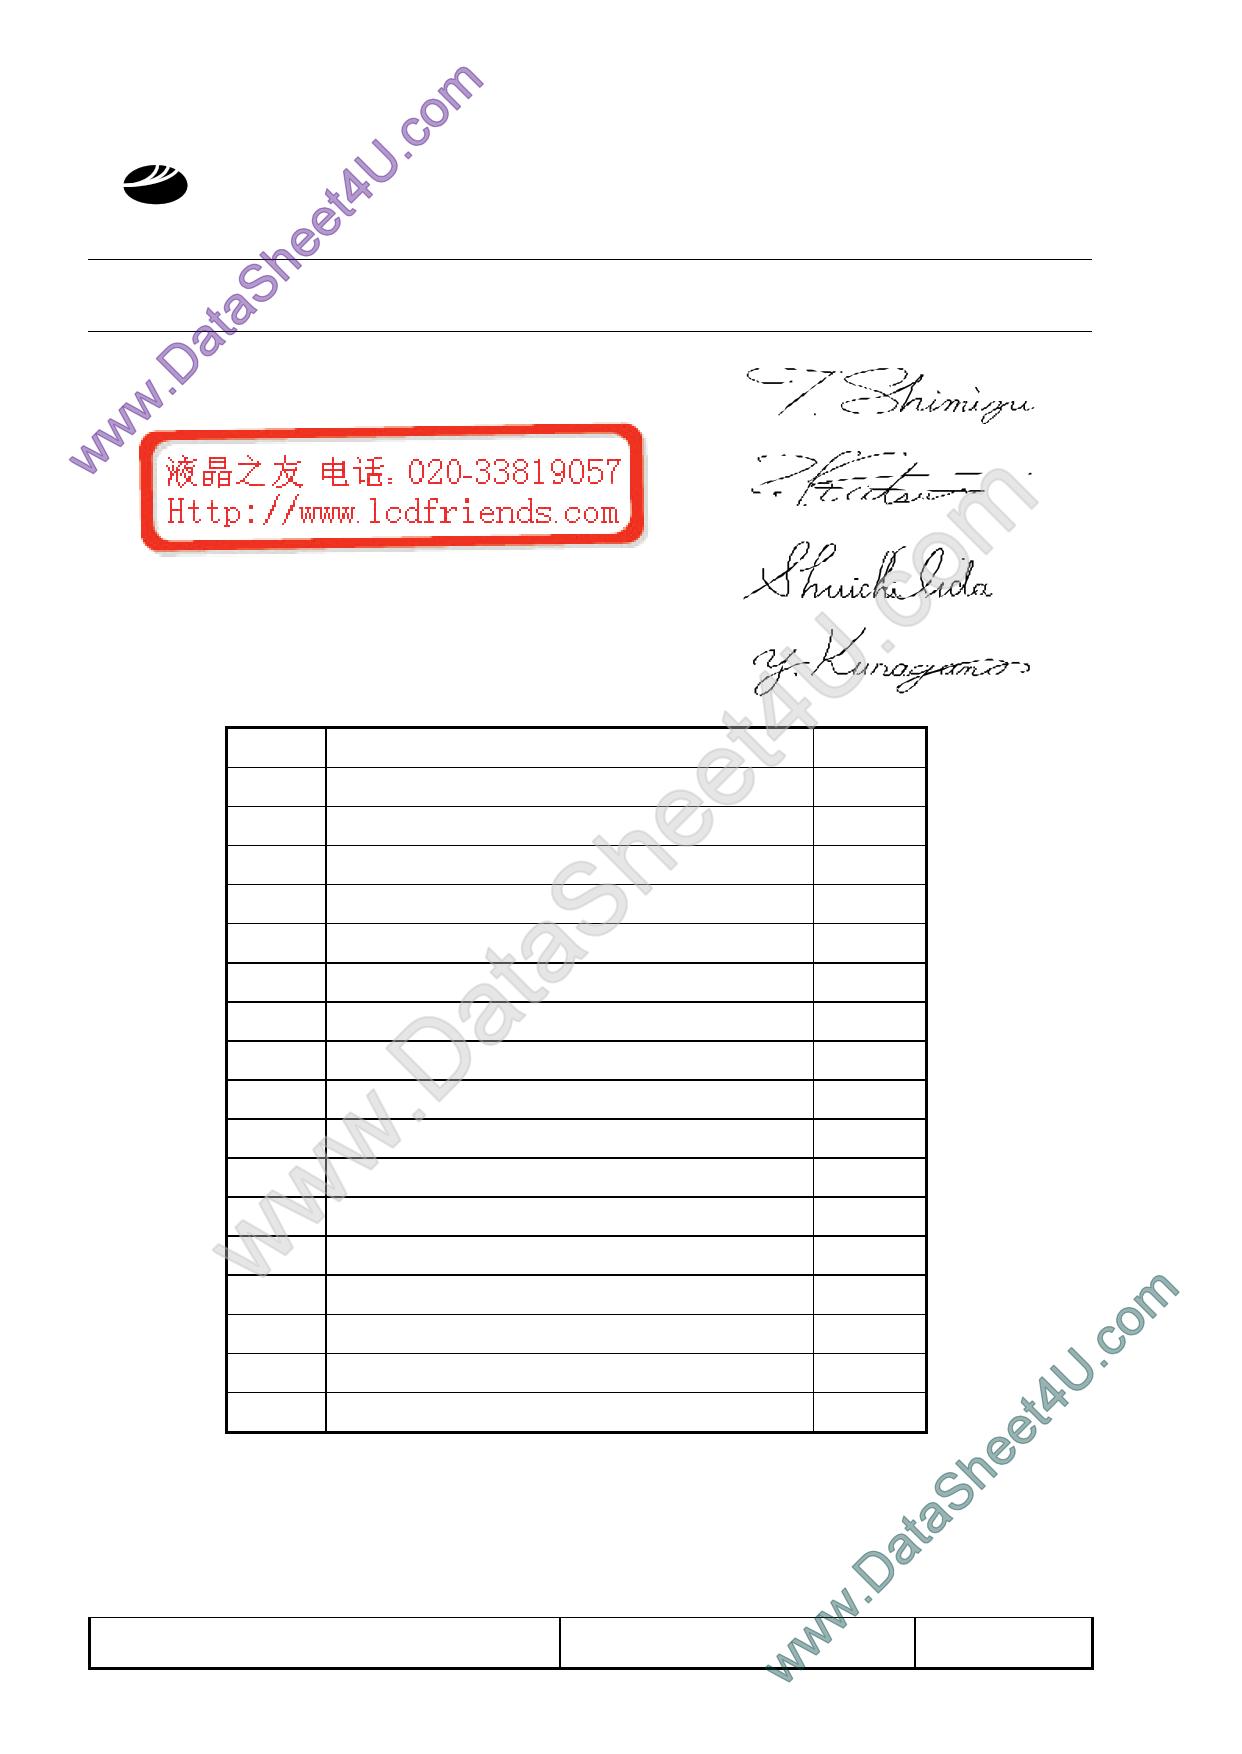 T-51410D104J-FW-P-AC دیتاشیت PDF